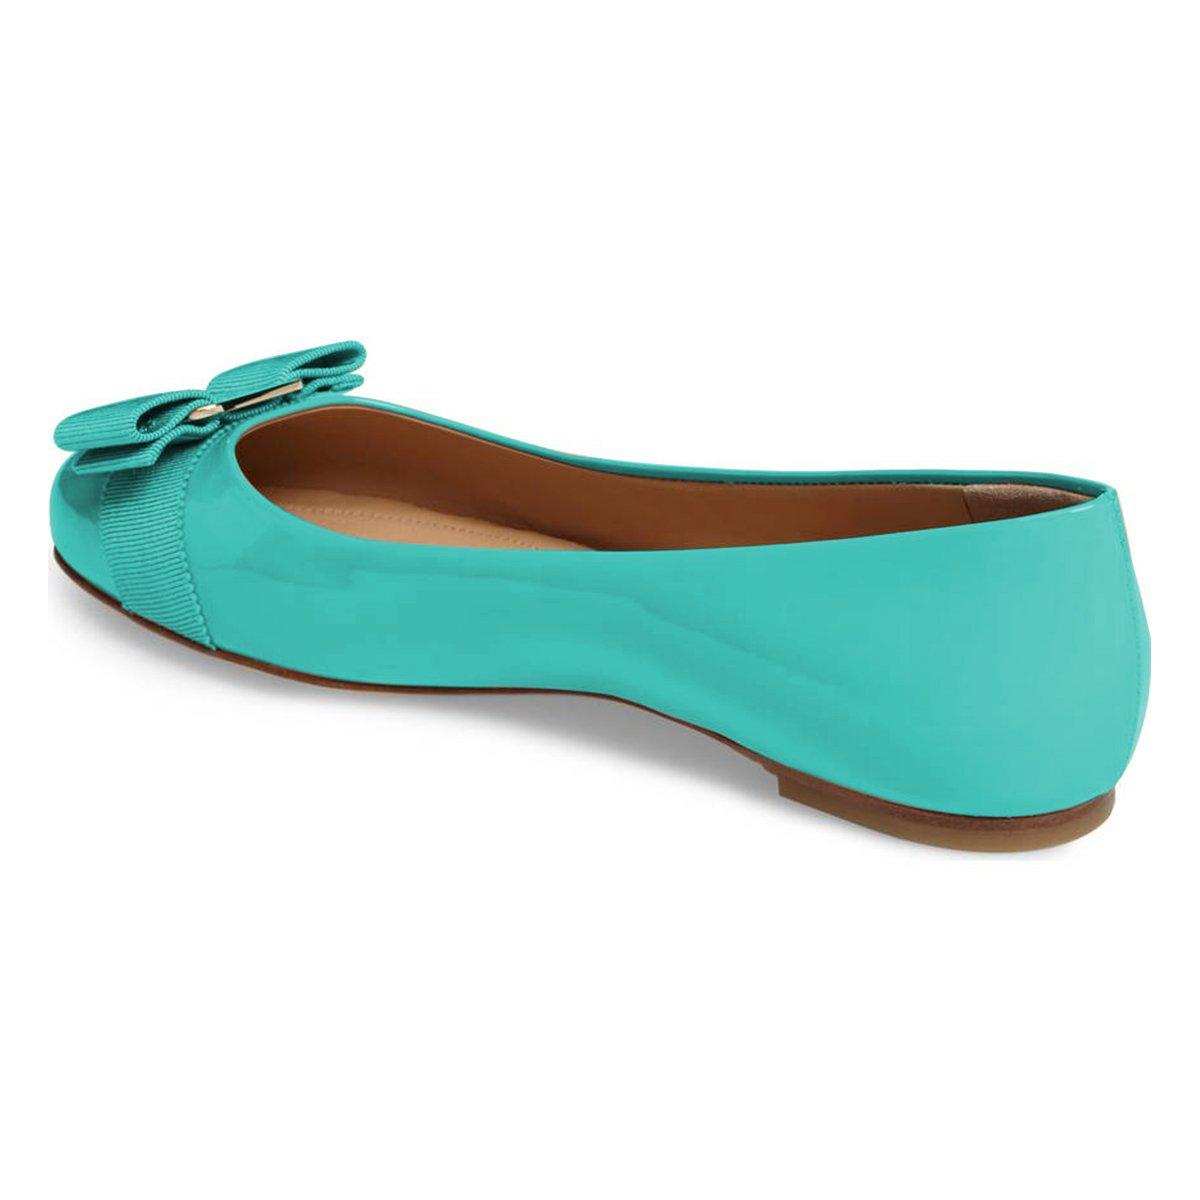 XYD Women Cute Bows Round Toe Ballet Flats Slip On Patent Basic Office Daily Shoes B07CNL4C6P 9 B(M) US|Aqua